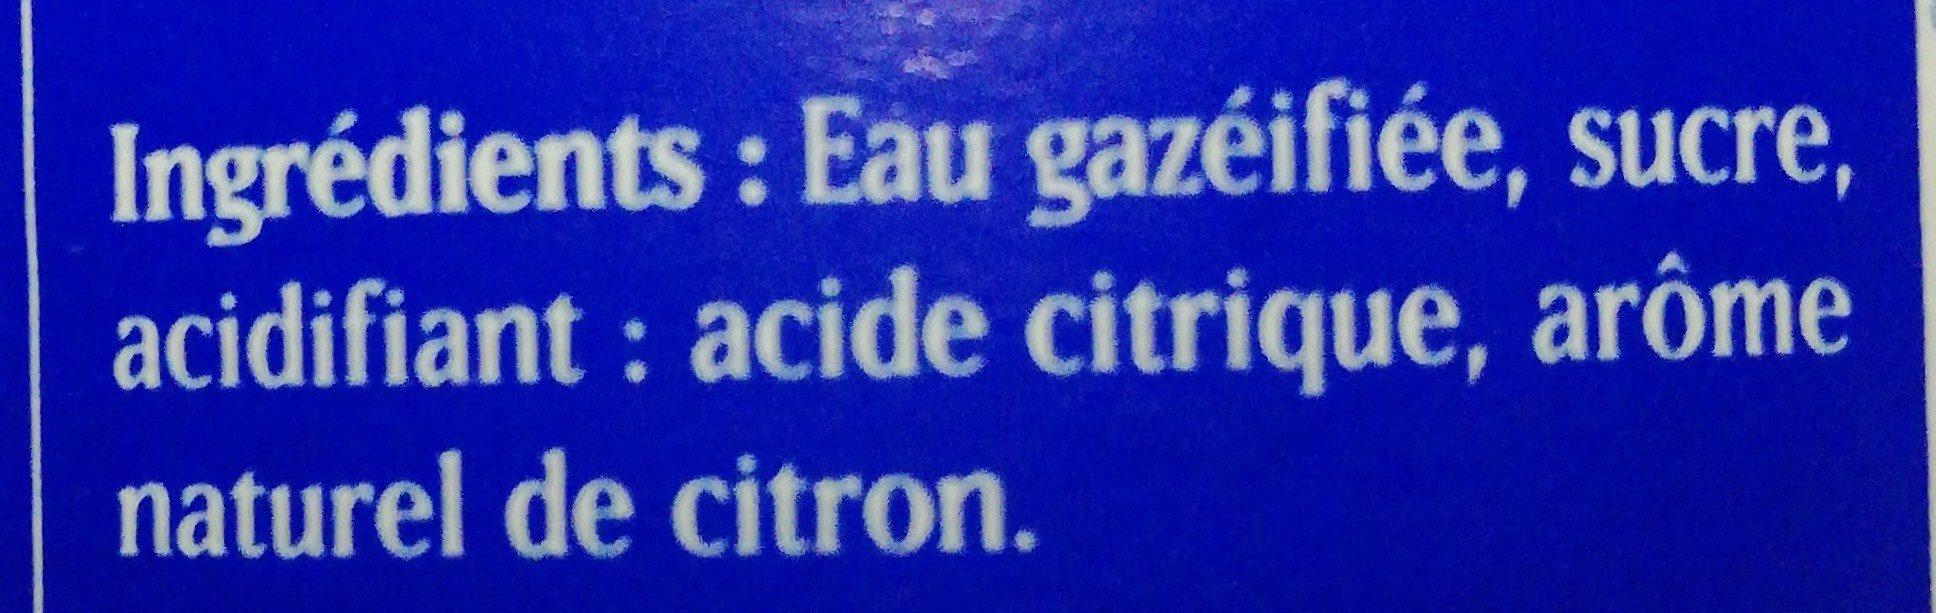 Limonade Artisanale - Ingredients